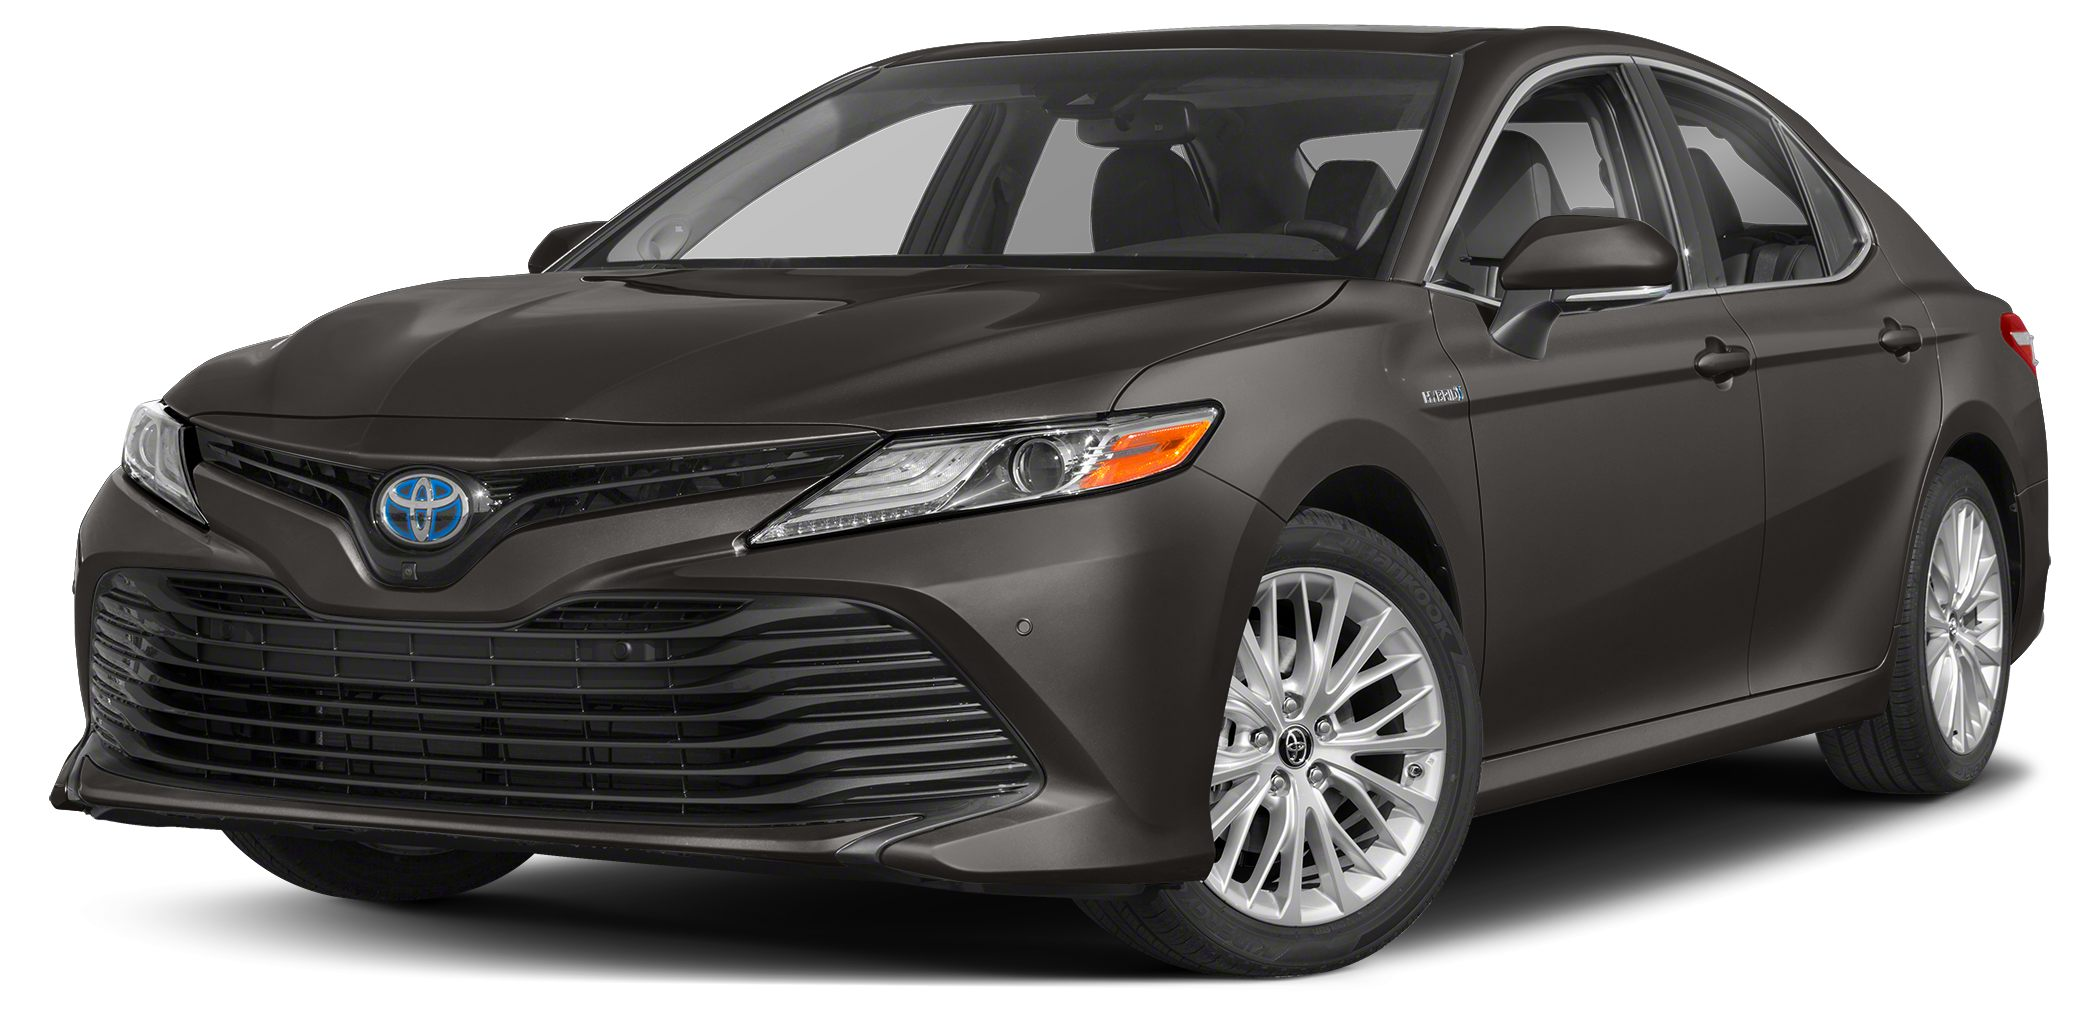 2018 Toyota Camry Hybrid SE Heated Seats Sunroof Keyless Start Dual Zone AC SUNROOF PACKAGE